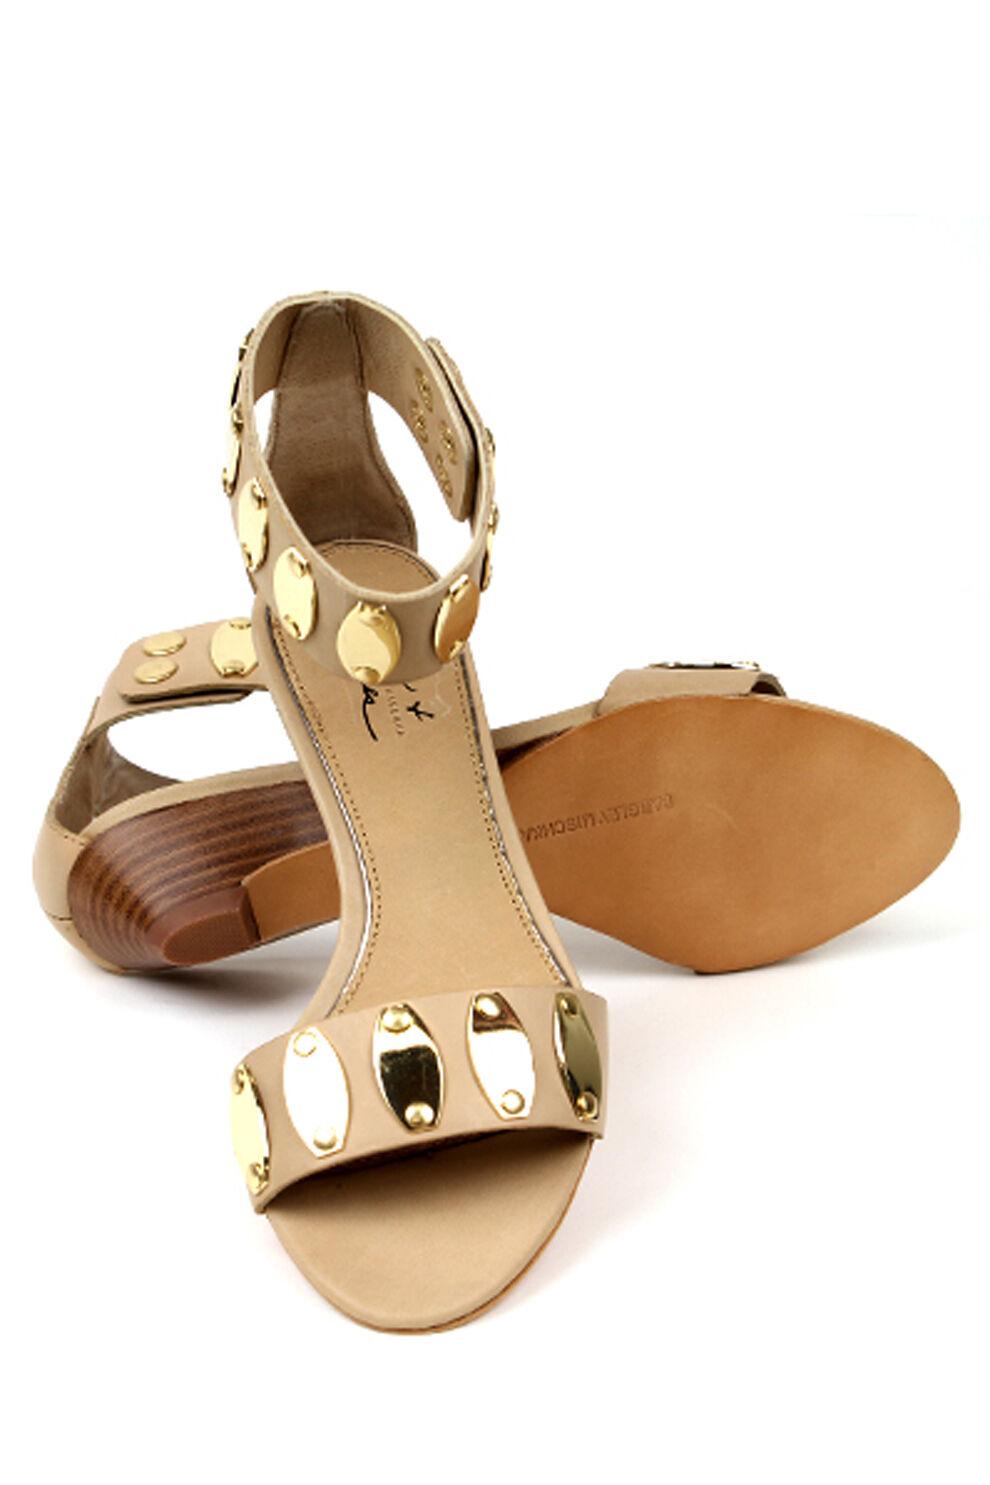 Mark & James Badgley Mischka Marissa Tan Gold 5 Leder Sandale Schuhes NEW